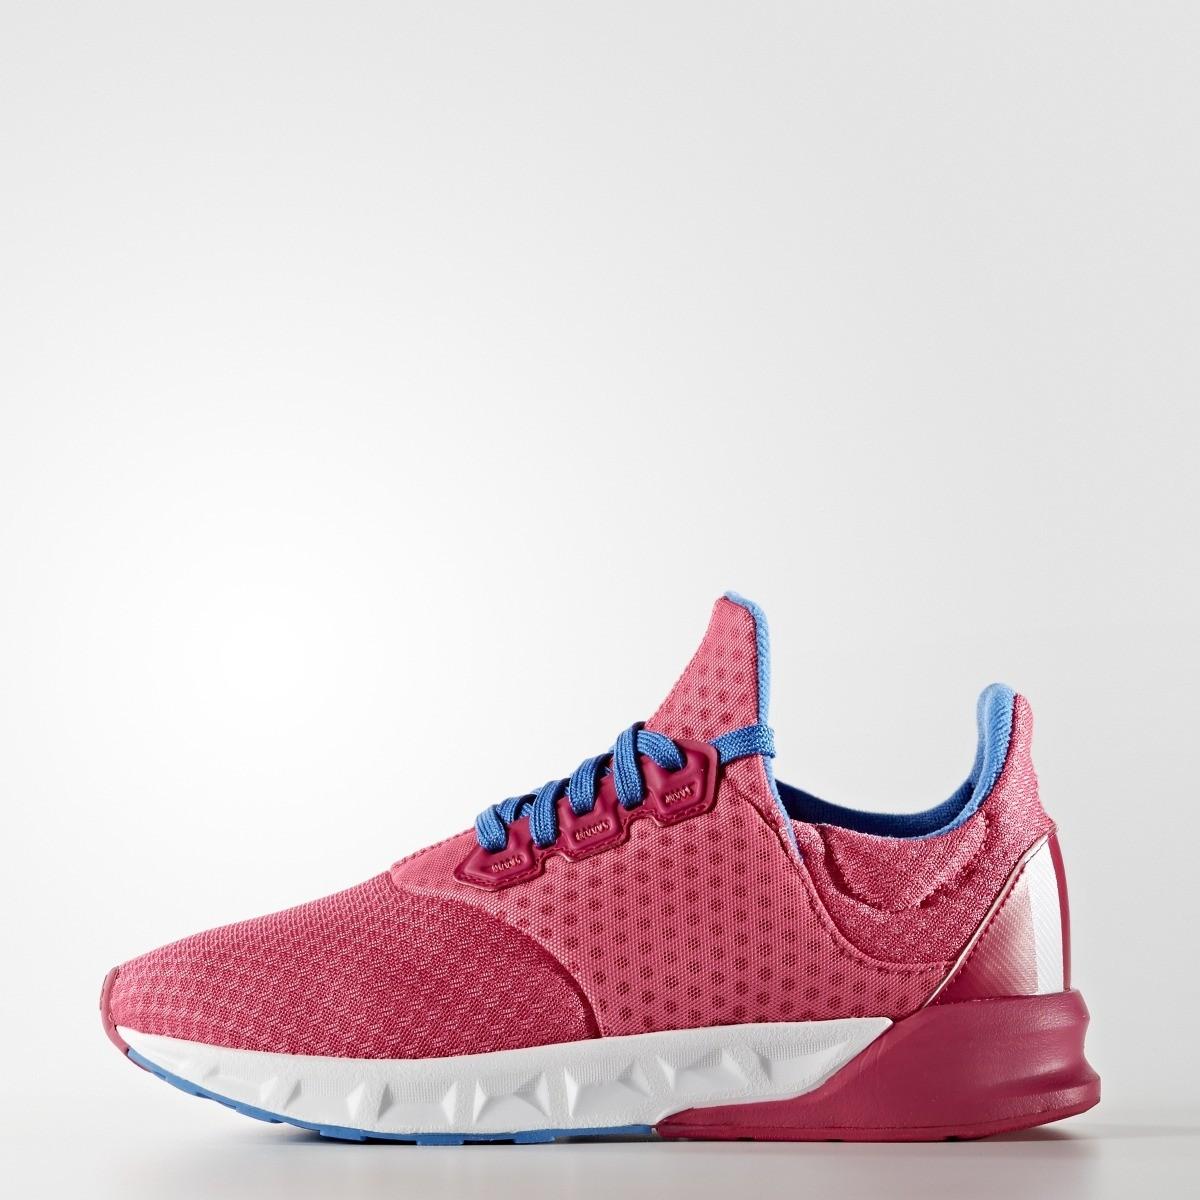 Dětská fitness obuv adidas falcon elite 5 xj ba584caaeb9